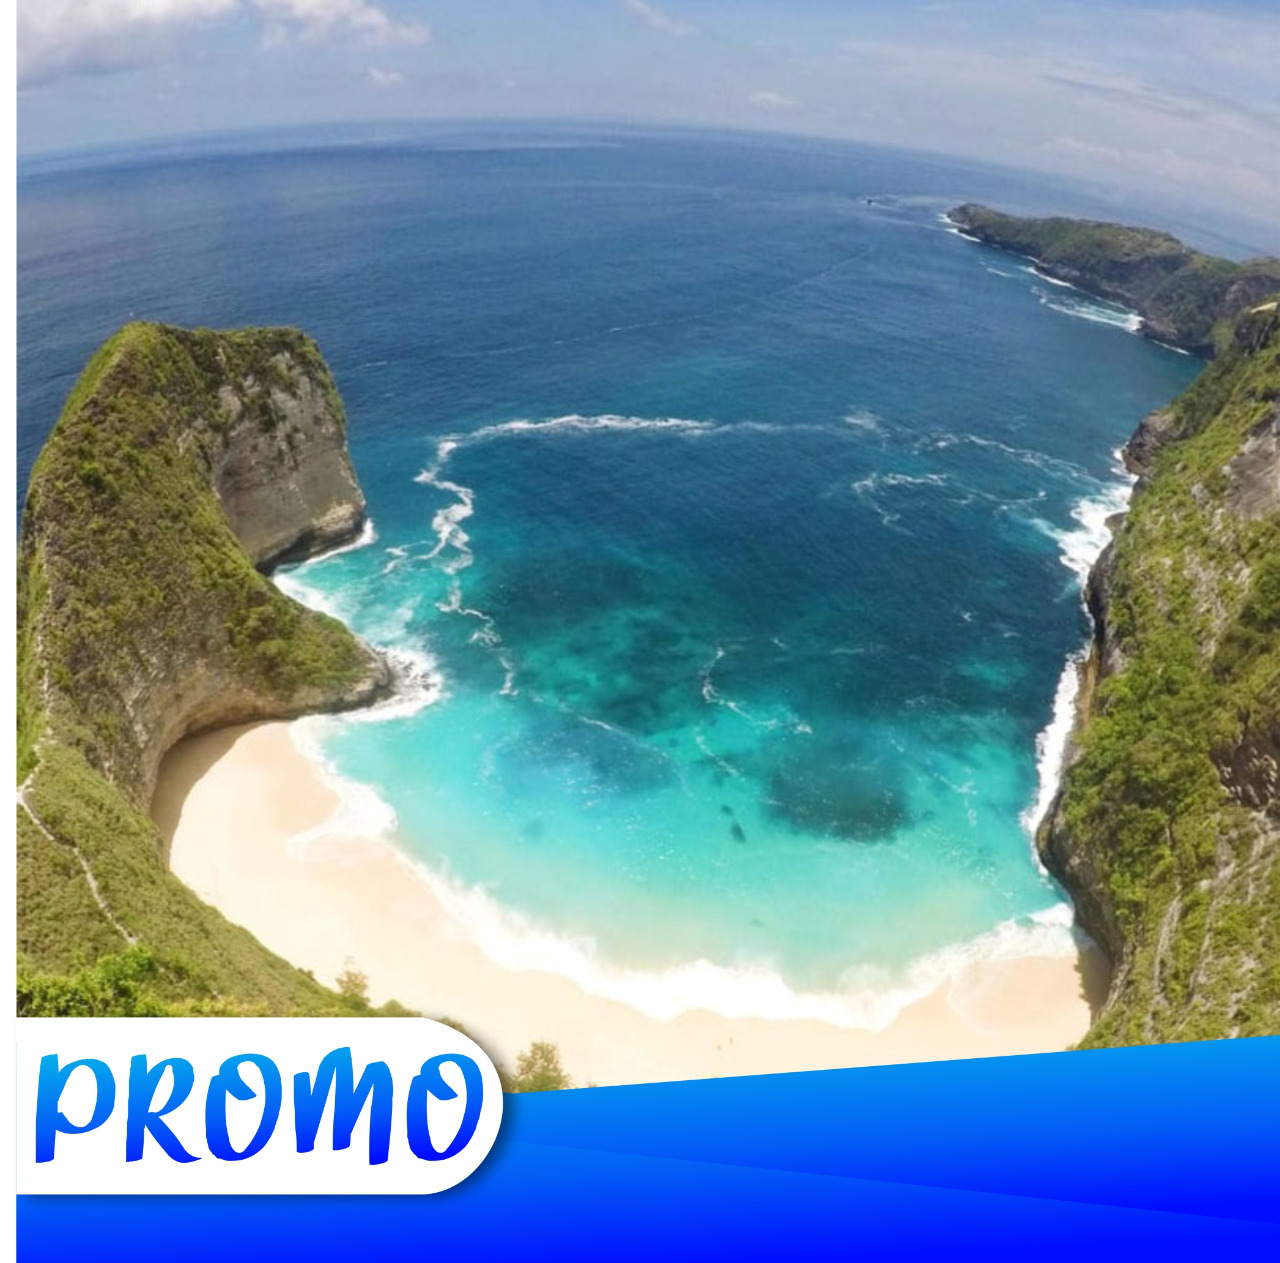 Jangan Lewatkan ! Promo New Normal Paket Wisata Nusa Penida